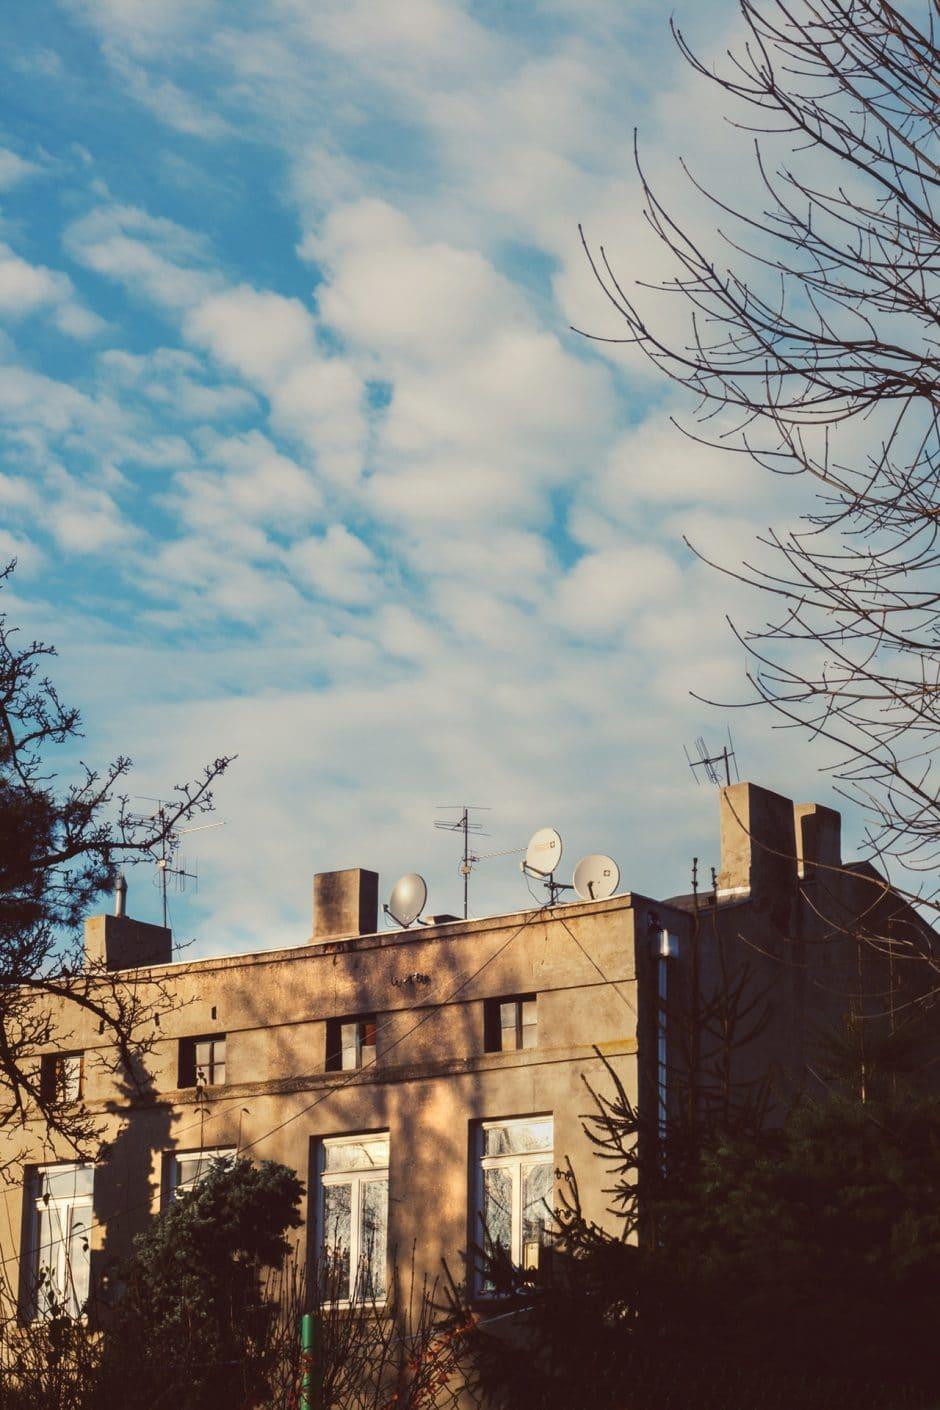 tenement-house-blue-sky-5533